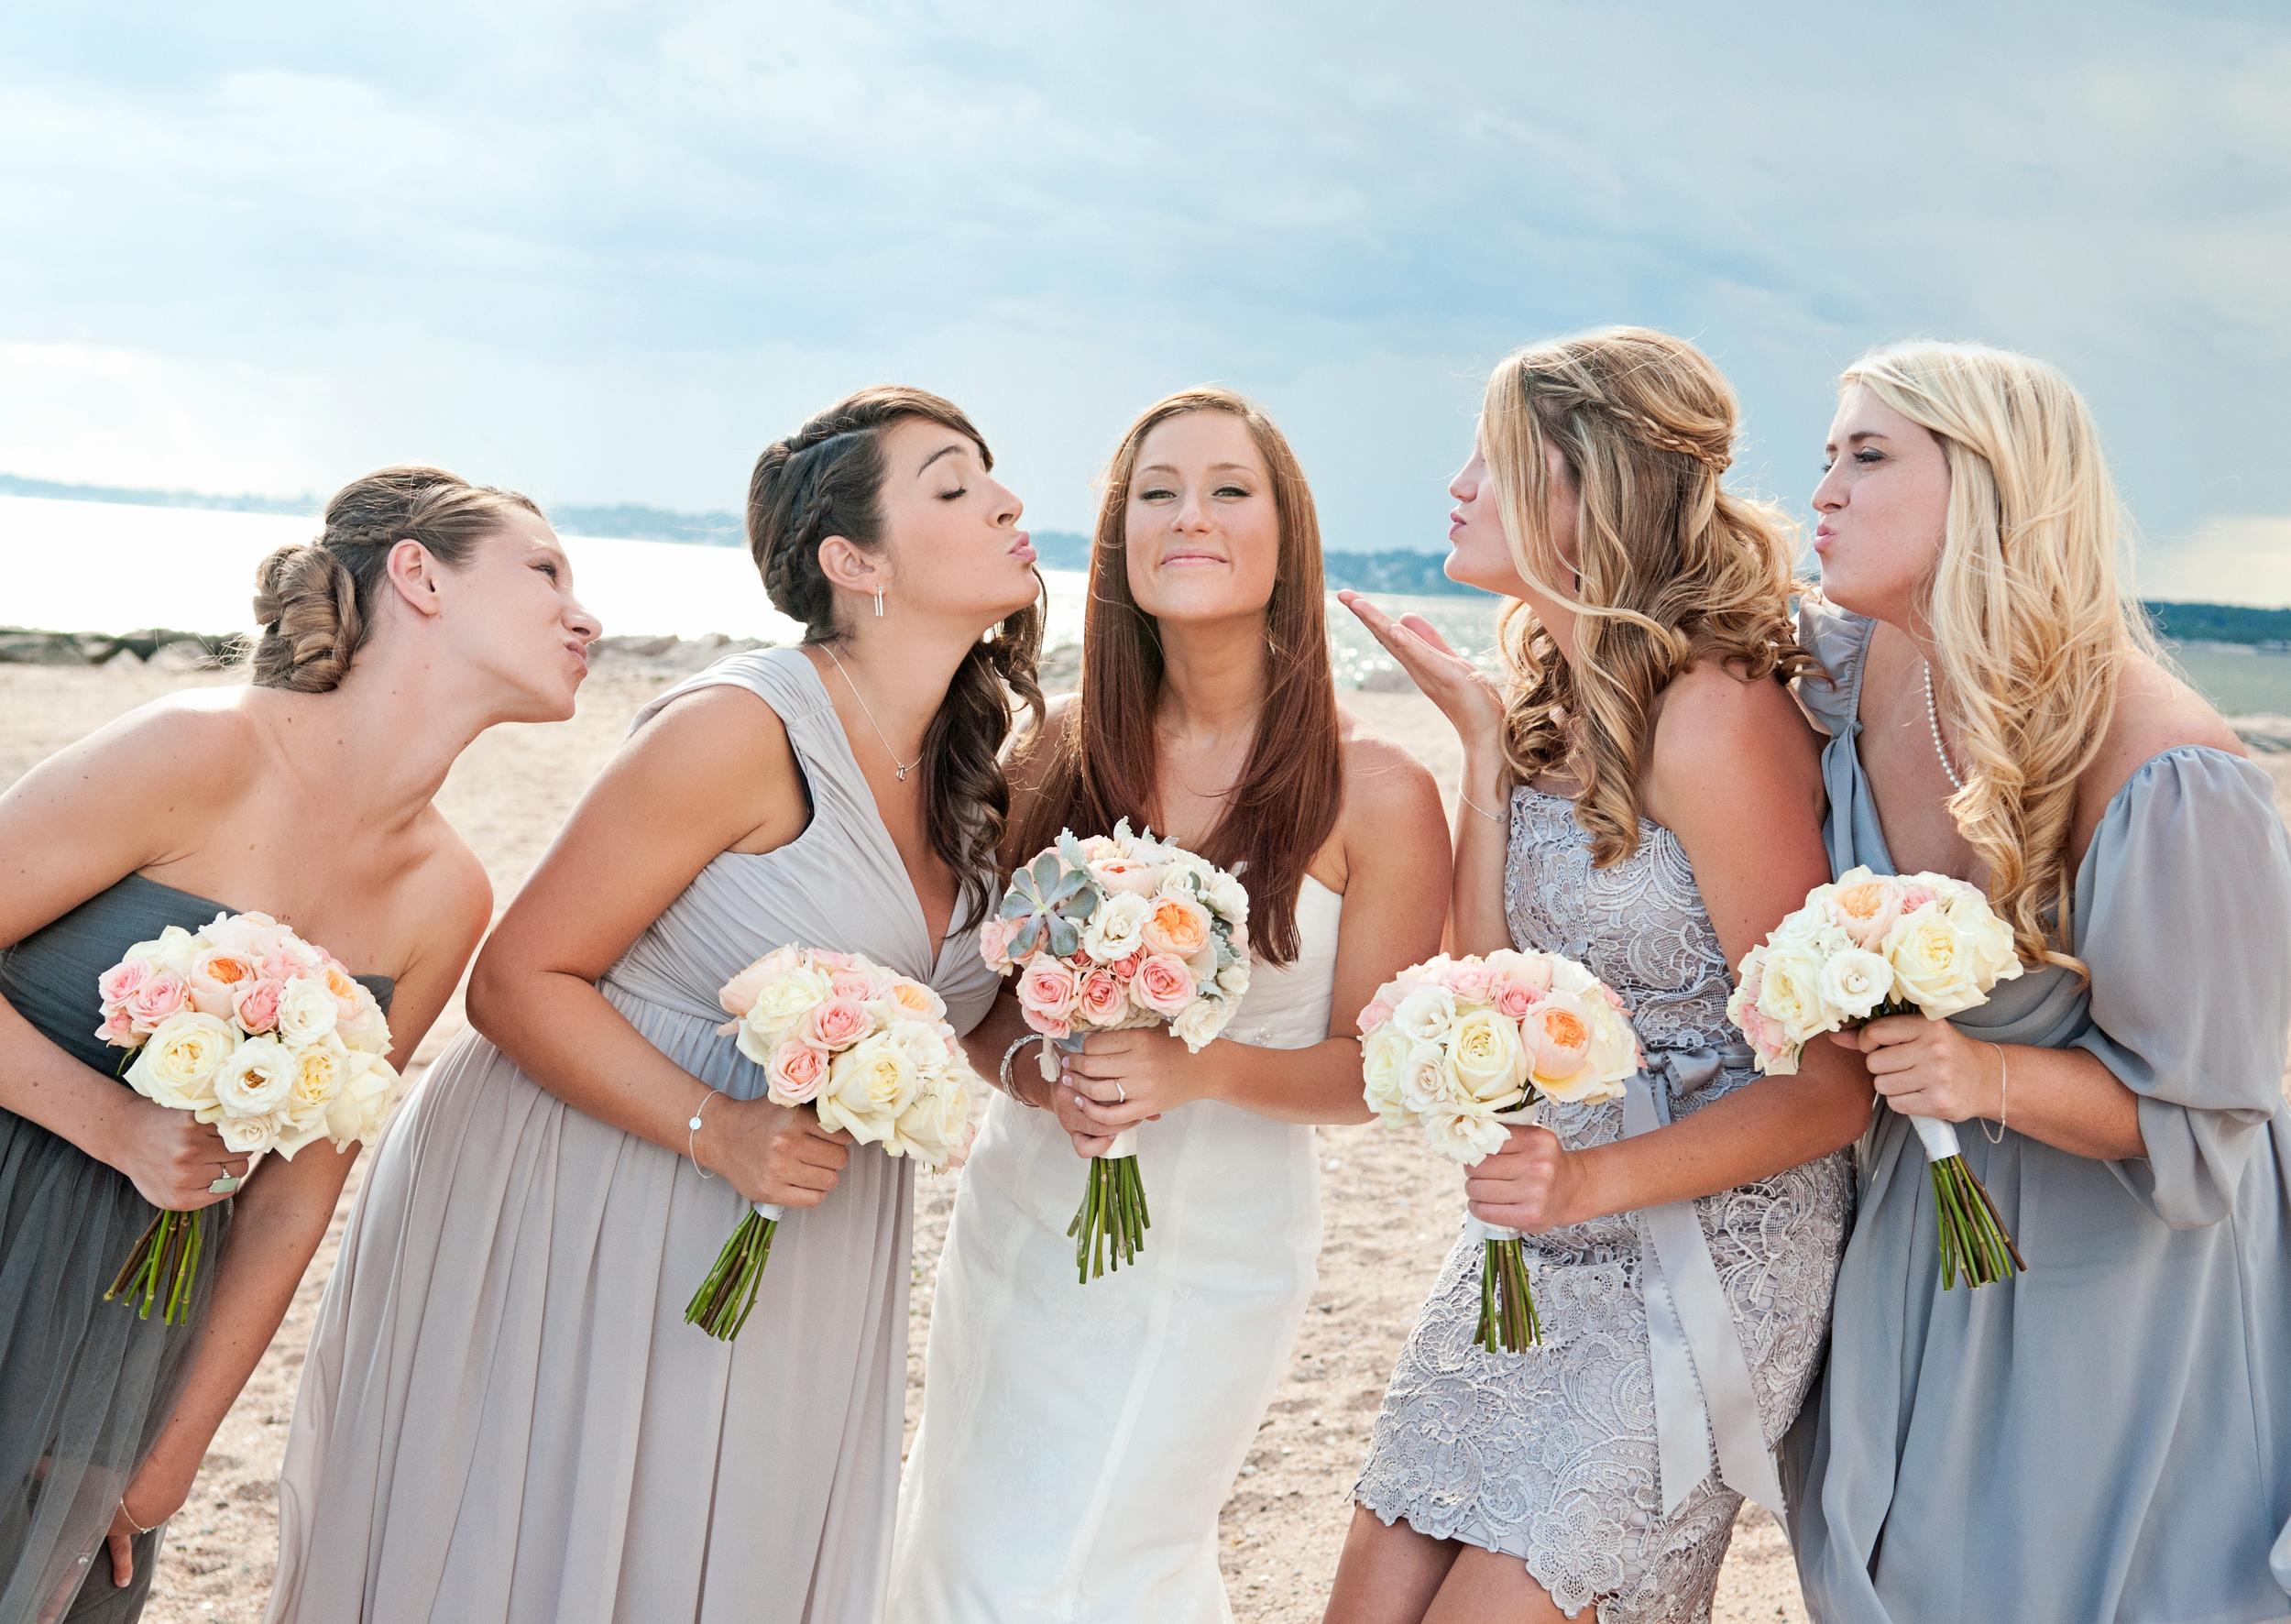 Angela_Chicoski_CT_wedding_photographer_066.jpg